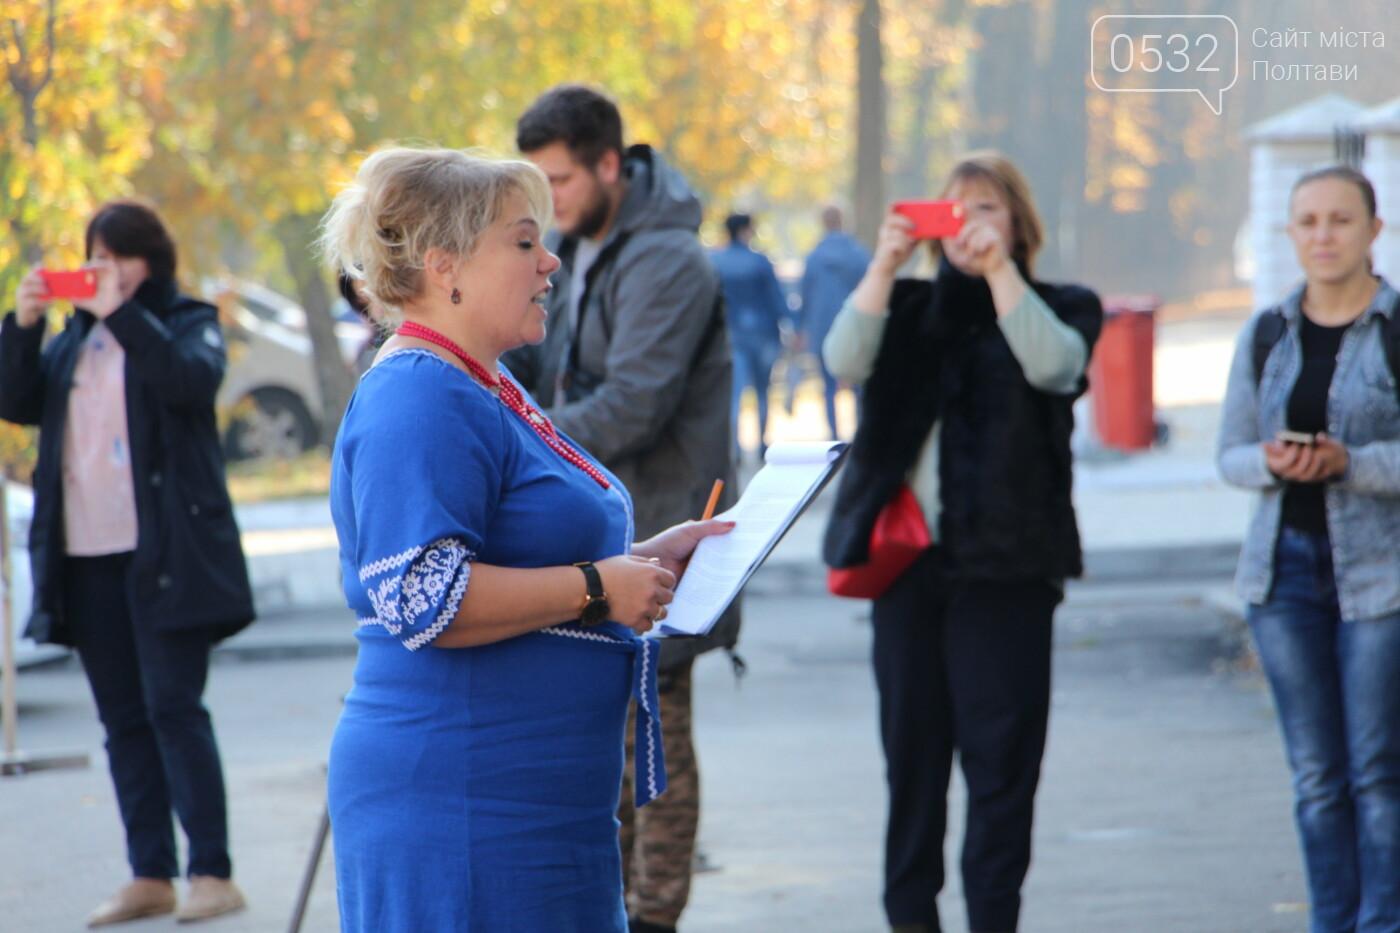 У Полтаві заклали калинову алею на честь Котляревського та загиблого Енея (ФОТО), фото-2